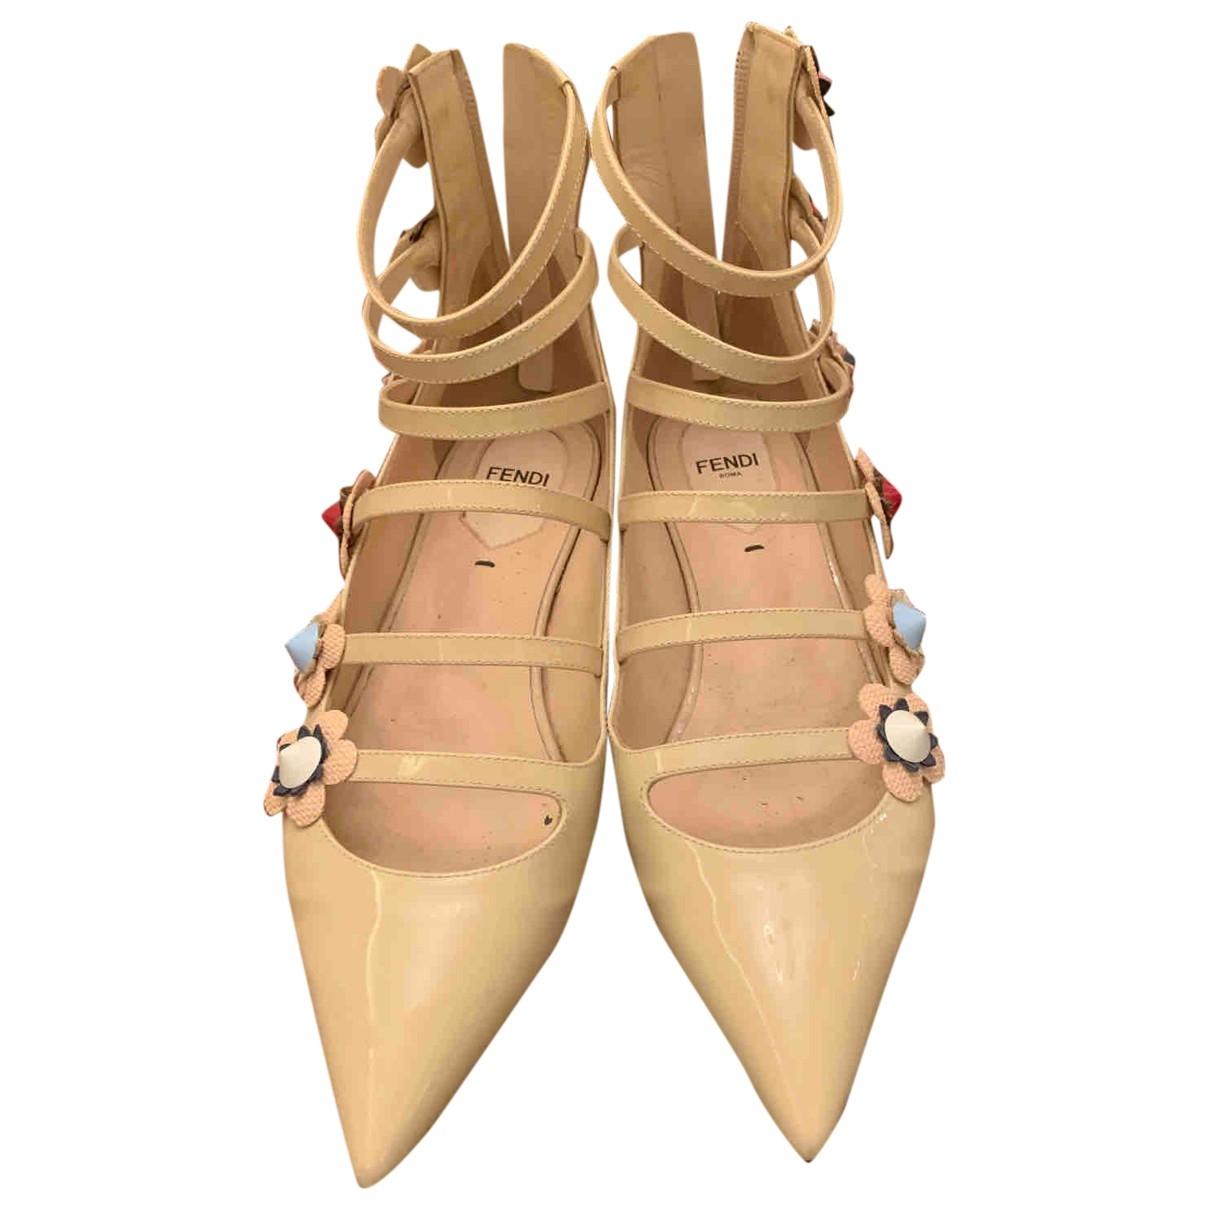 Bailarinas de Charol Fendi